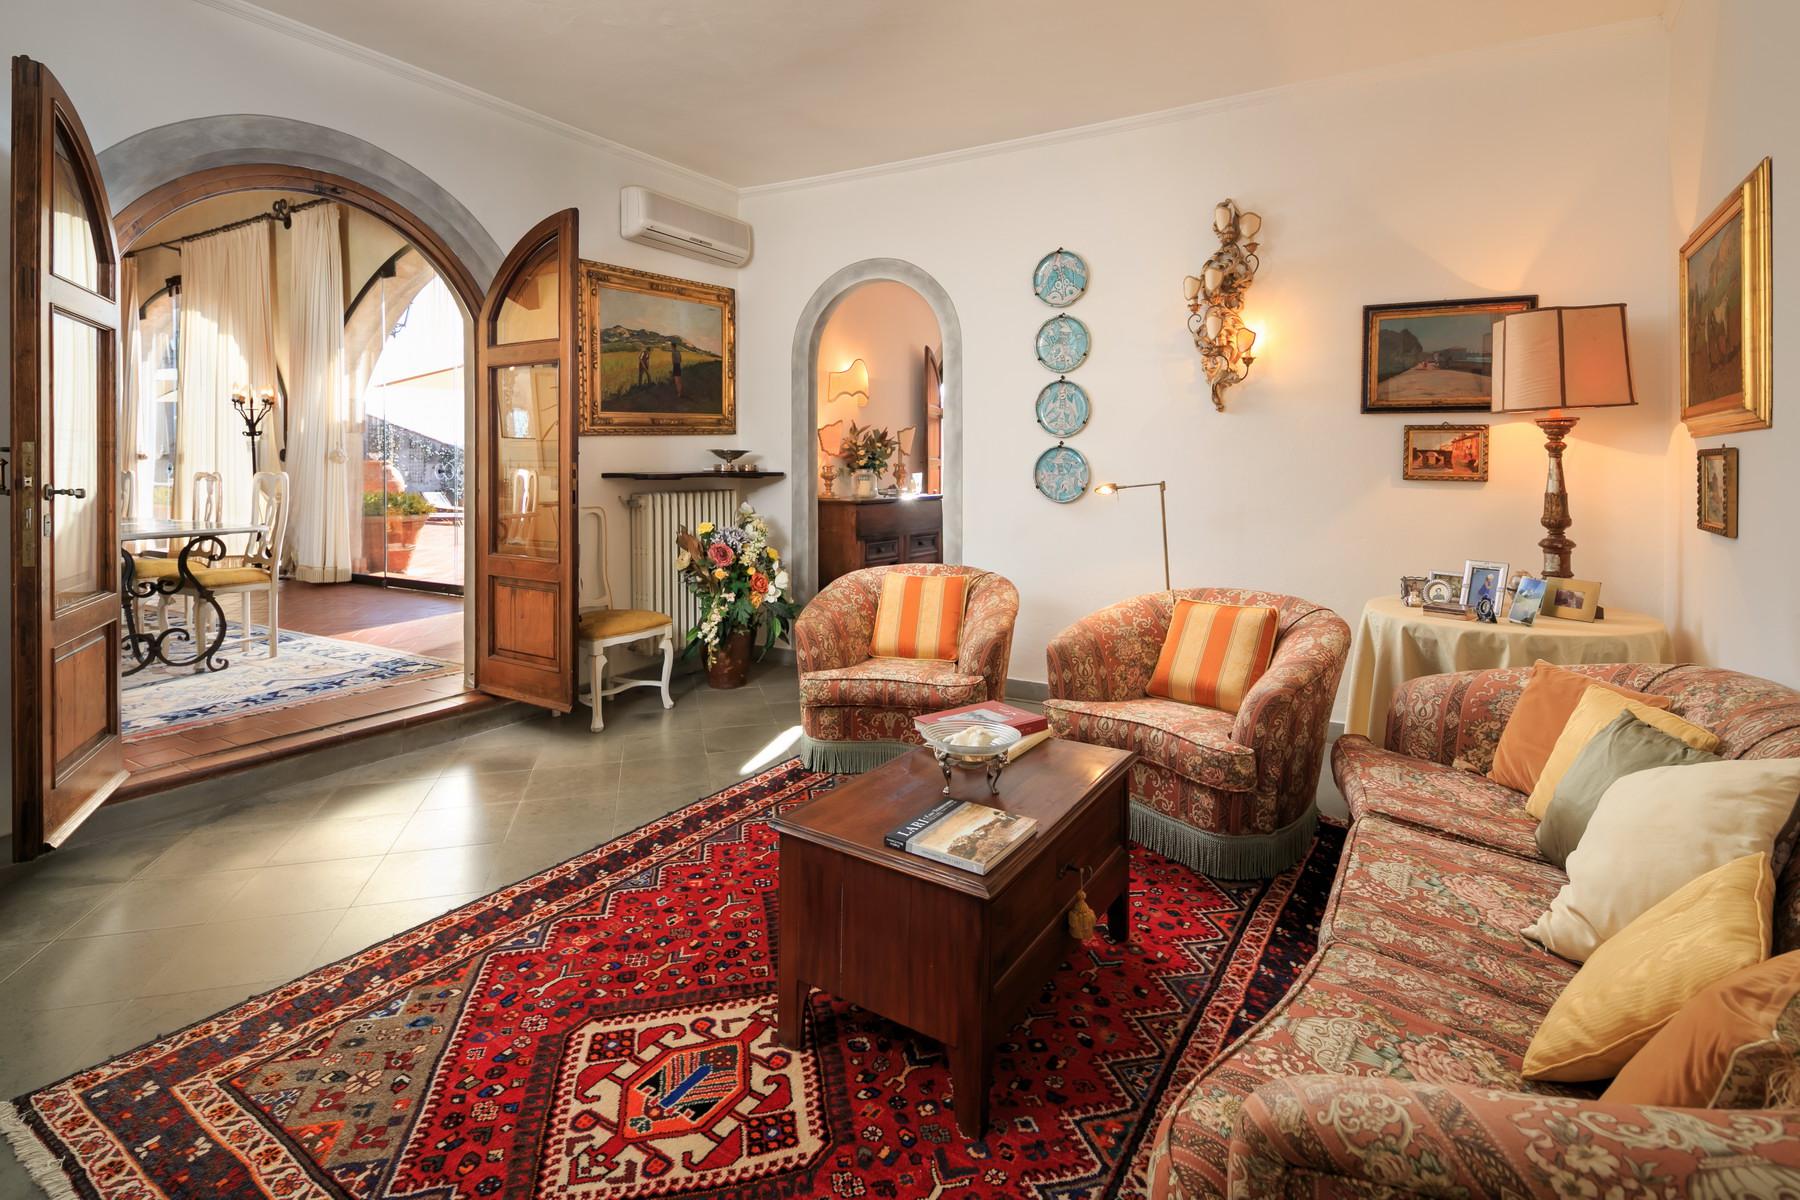 Villa in Vendita a Casciana Terme Lari: 5 locali, 550 mq - Foto 17